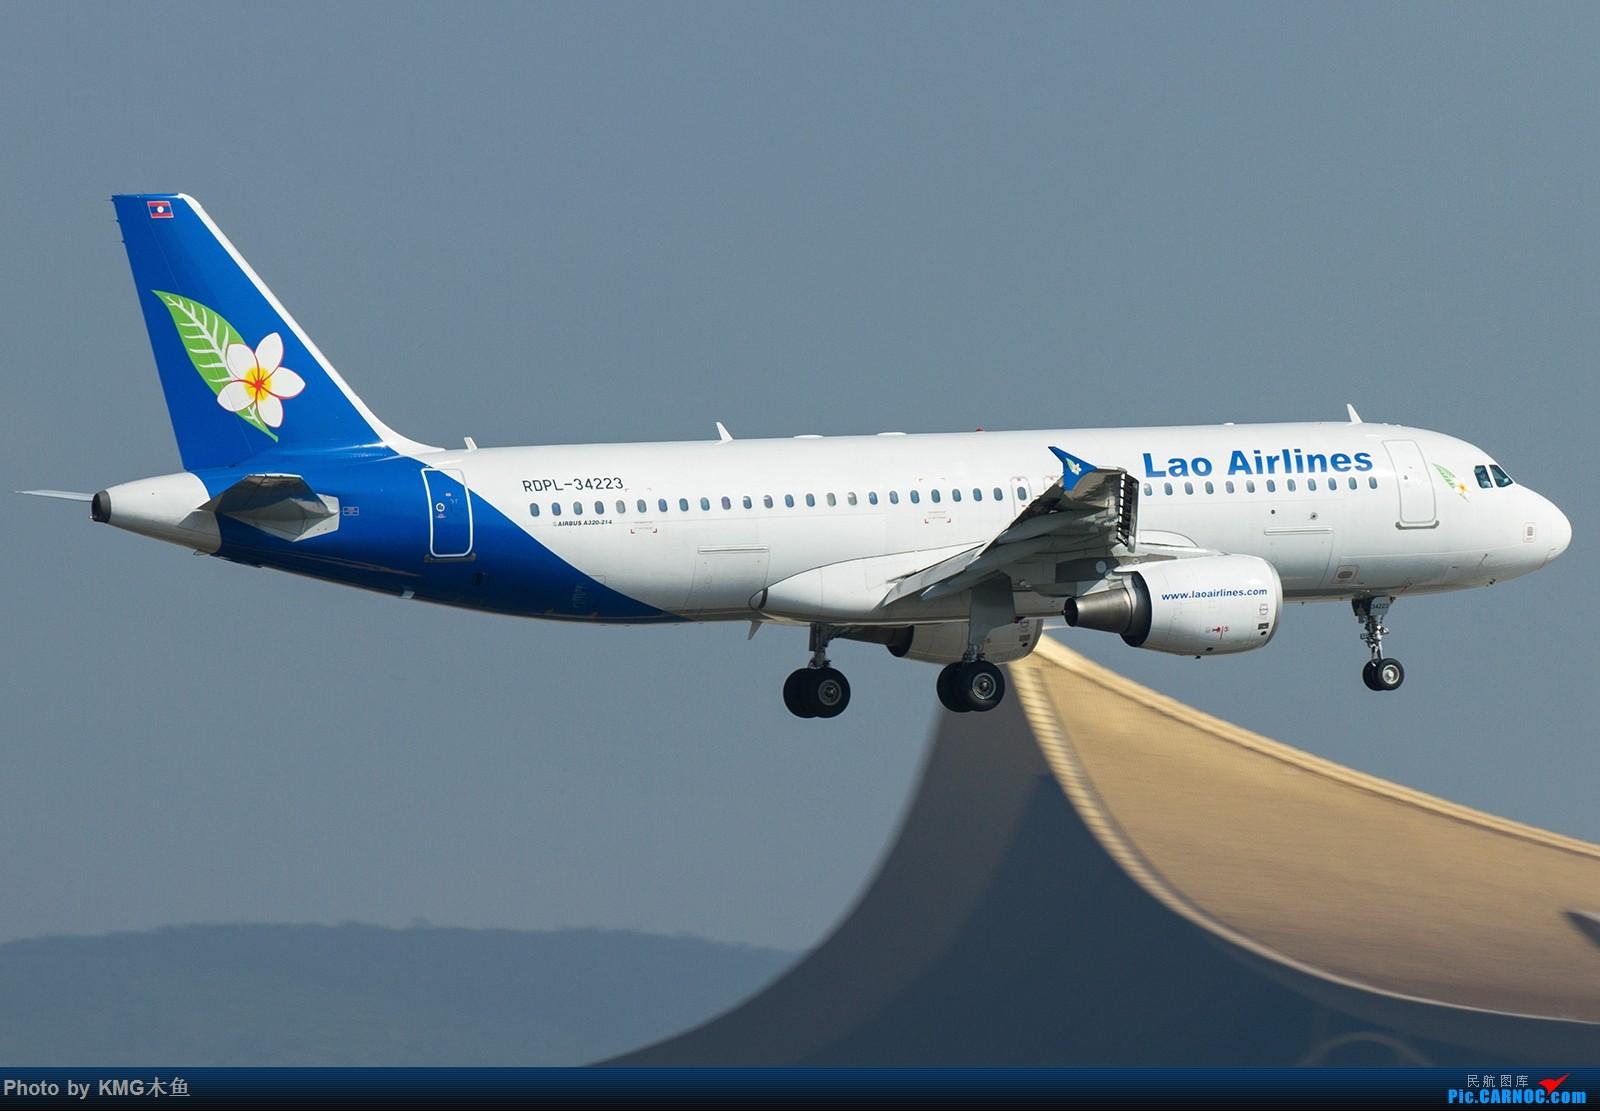 Re:[原创]【昆明长水国际机场——KMG木鱼拍机】向着功勋级出发,把库存图拿出来发了(高清大图) AIRBUS A320-200 RDPL-34223 中国昆明长水国际机场